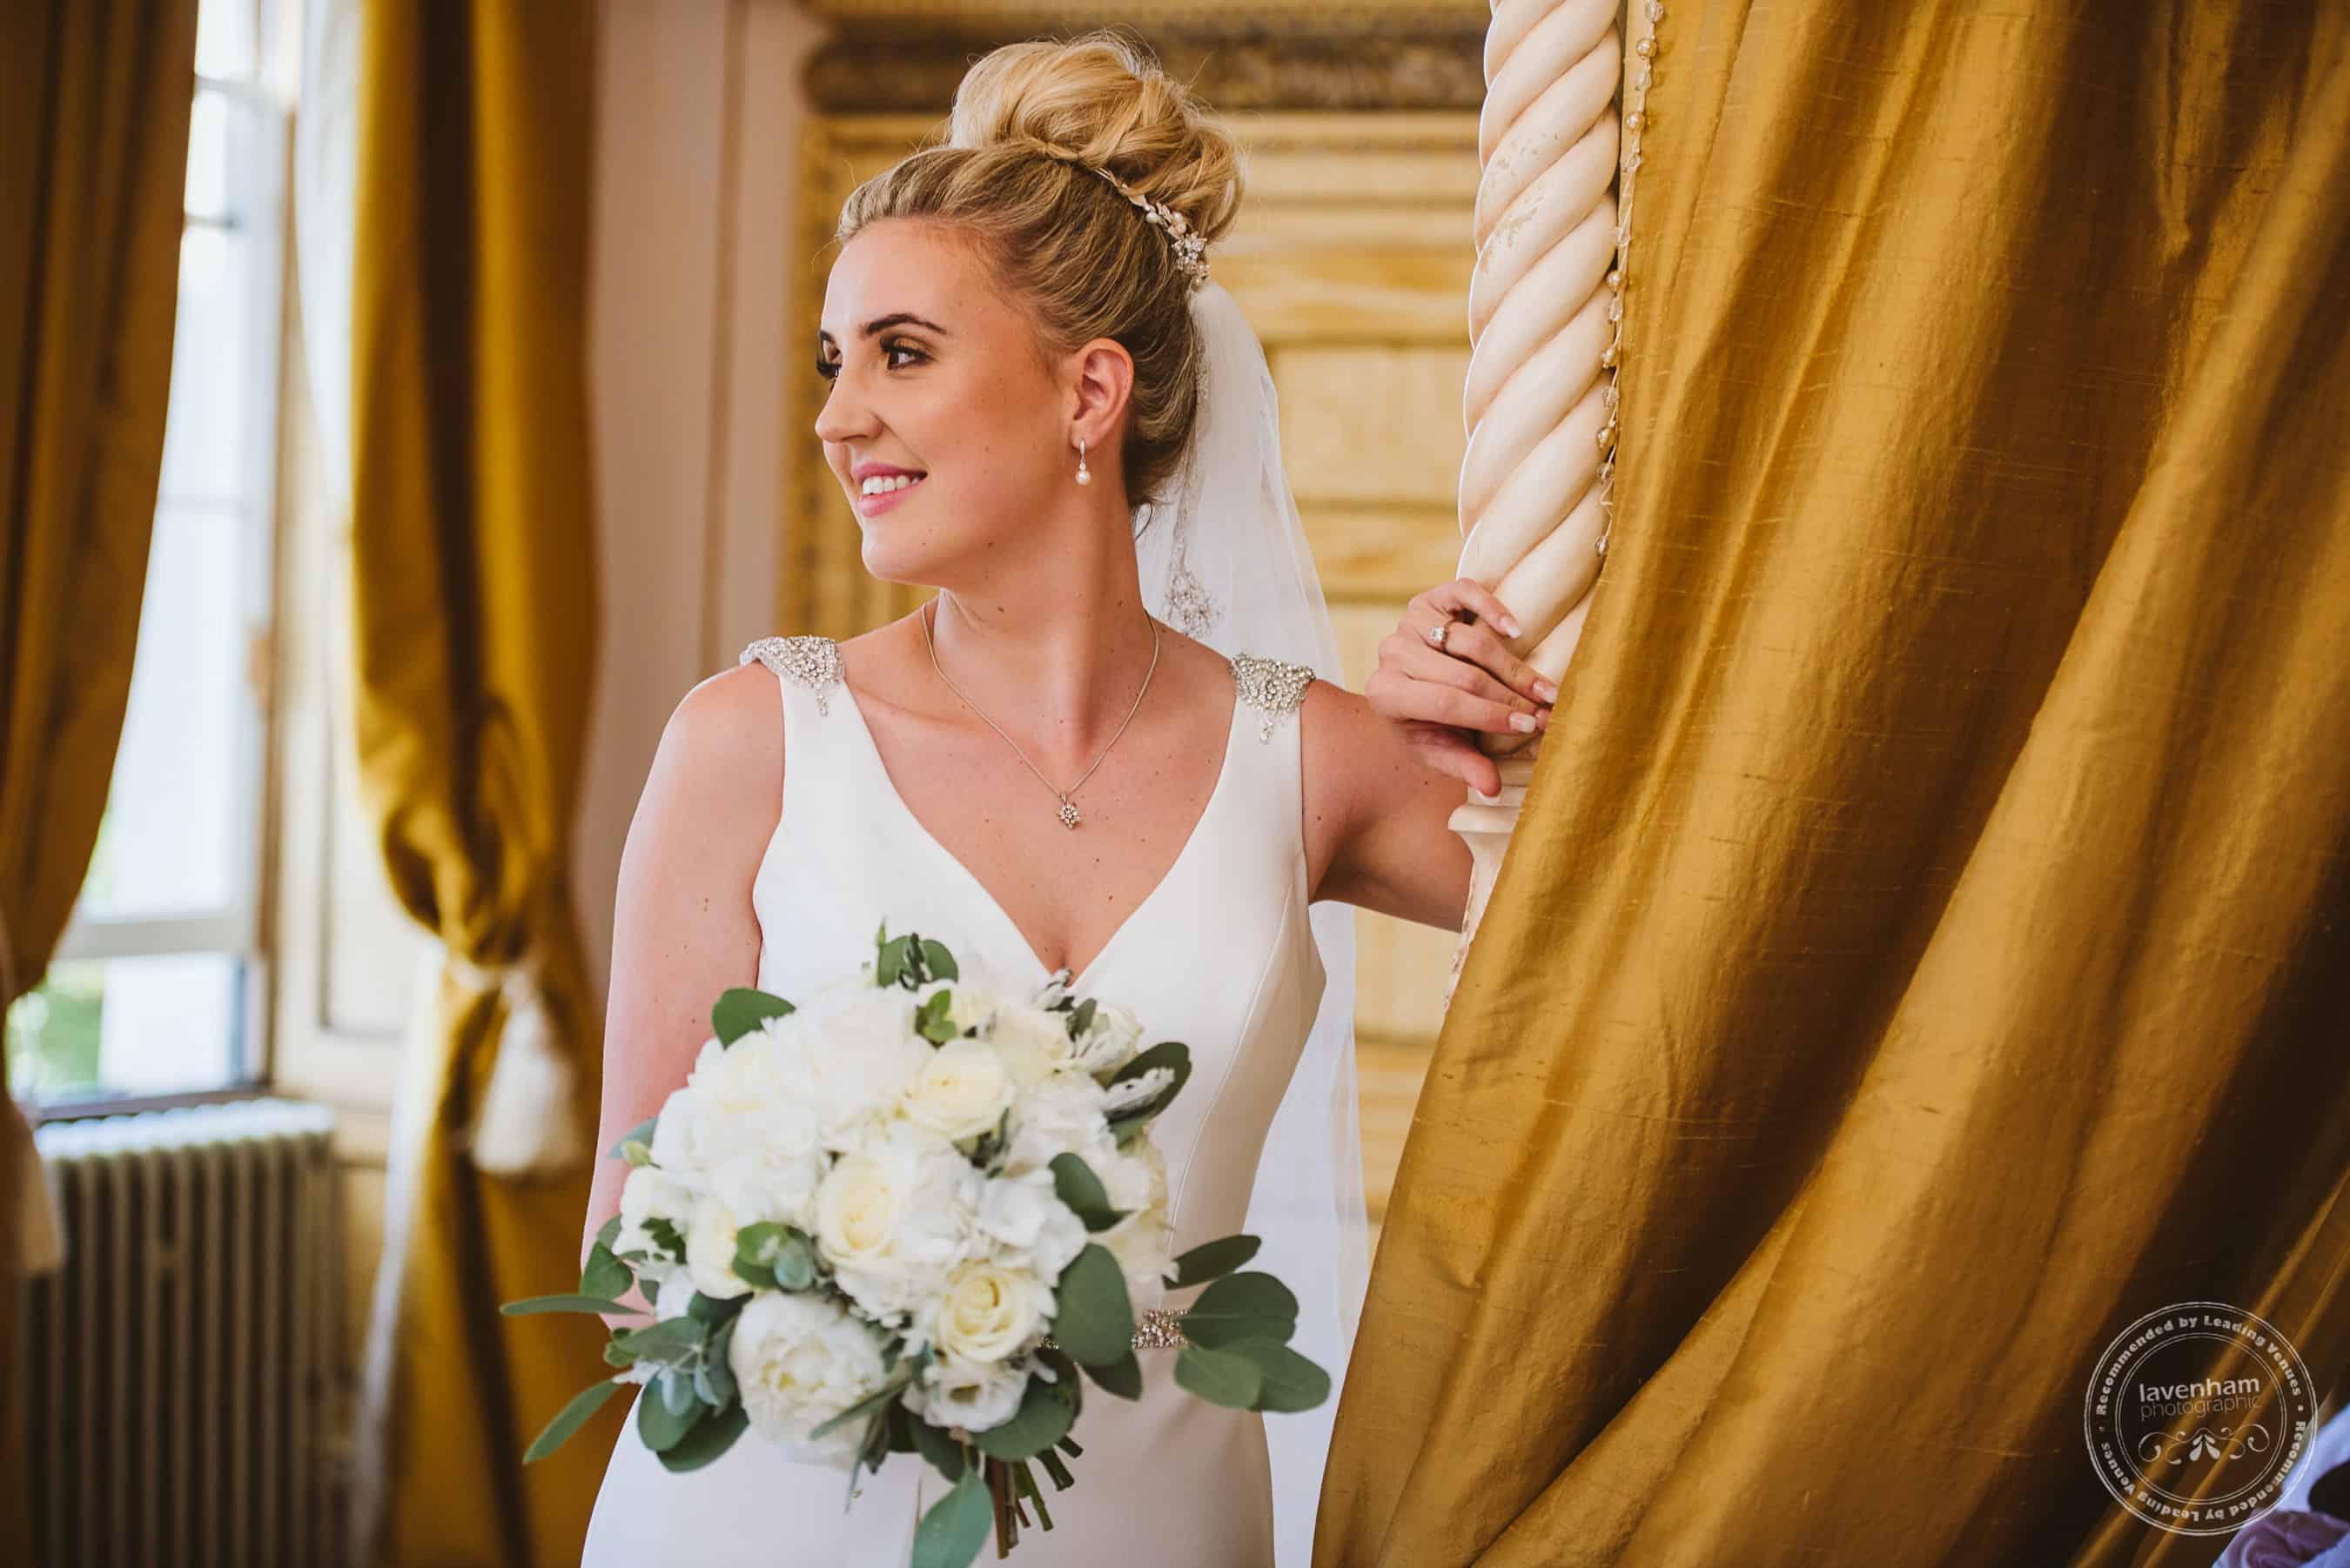 220618 Gosfield Hall Wedding Photography Lavenham Photographic 0032